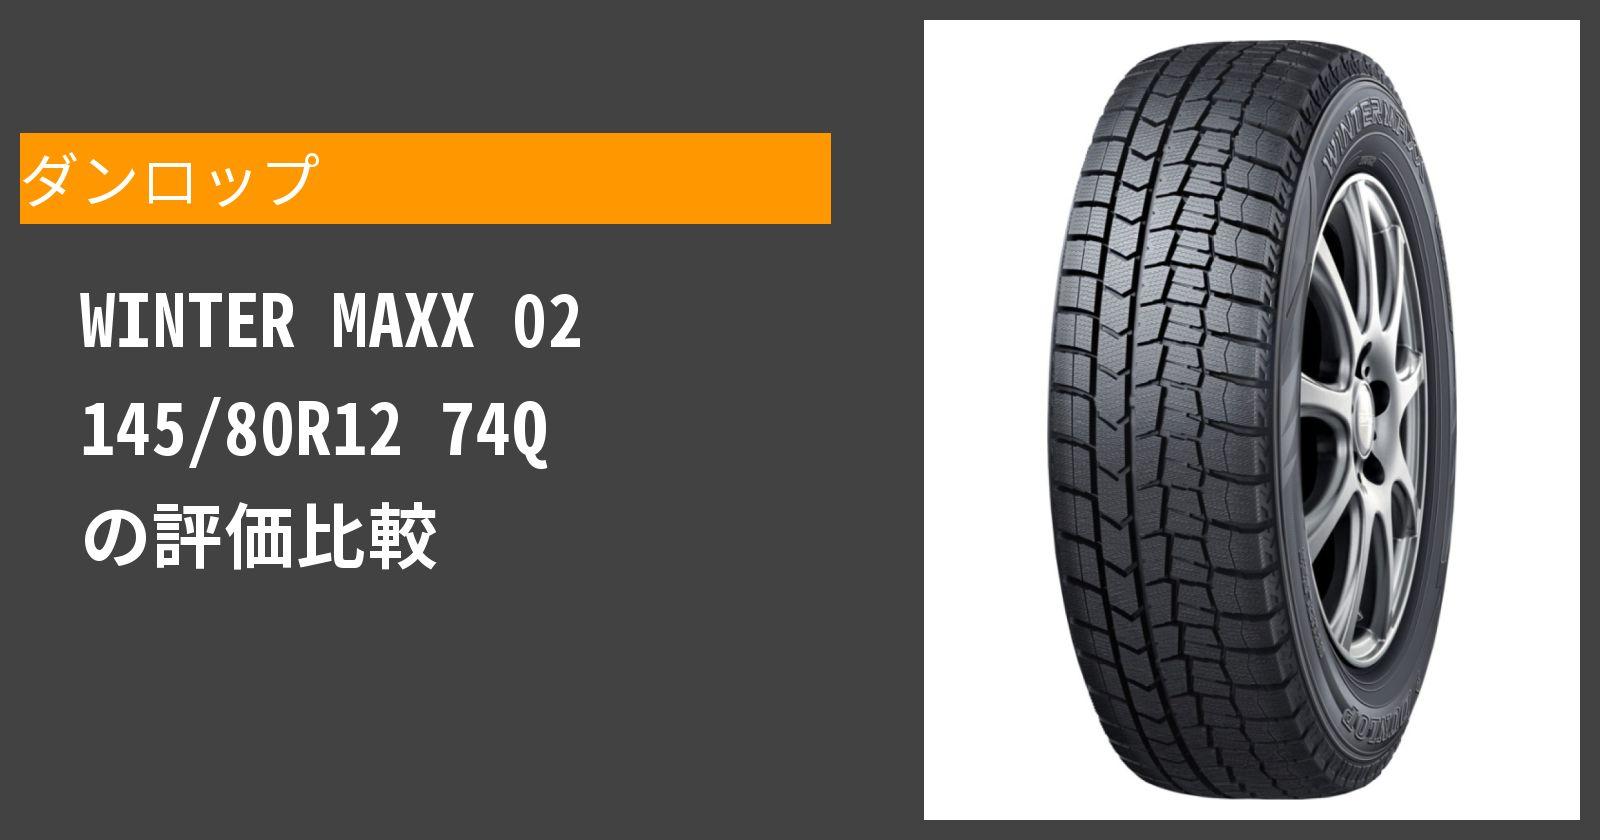 WINTER MAXX 02 145/80R12 74Qを徹底評価